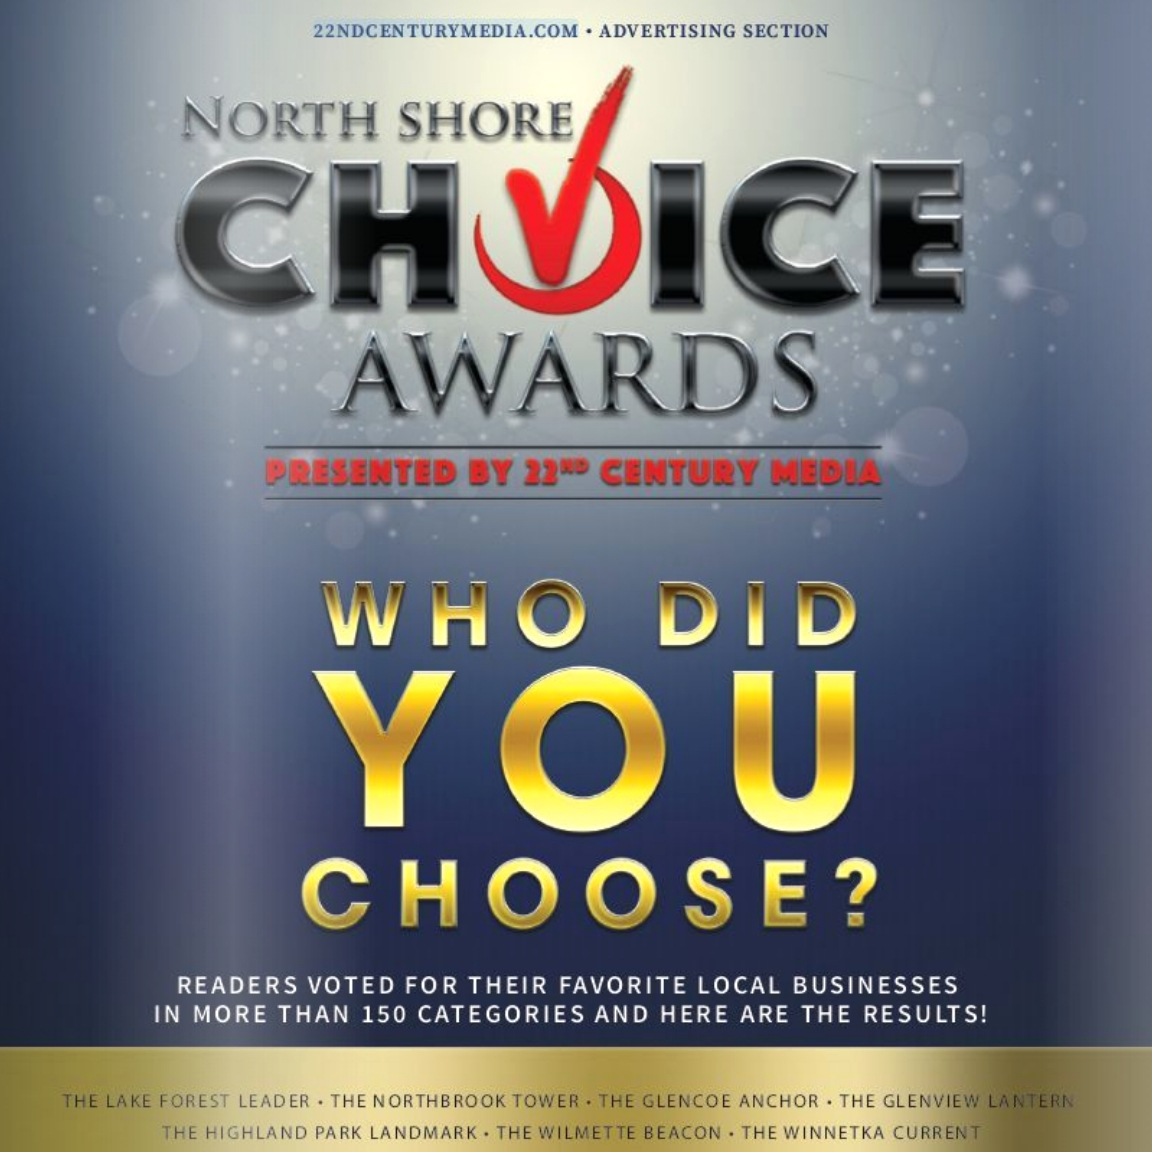 North Shore Choice Awards_22nd Century Media Cover.jpg